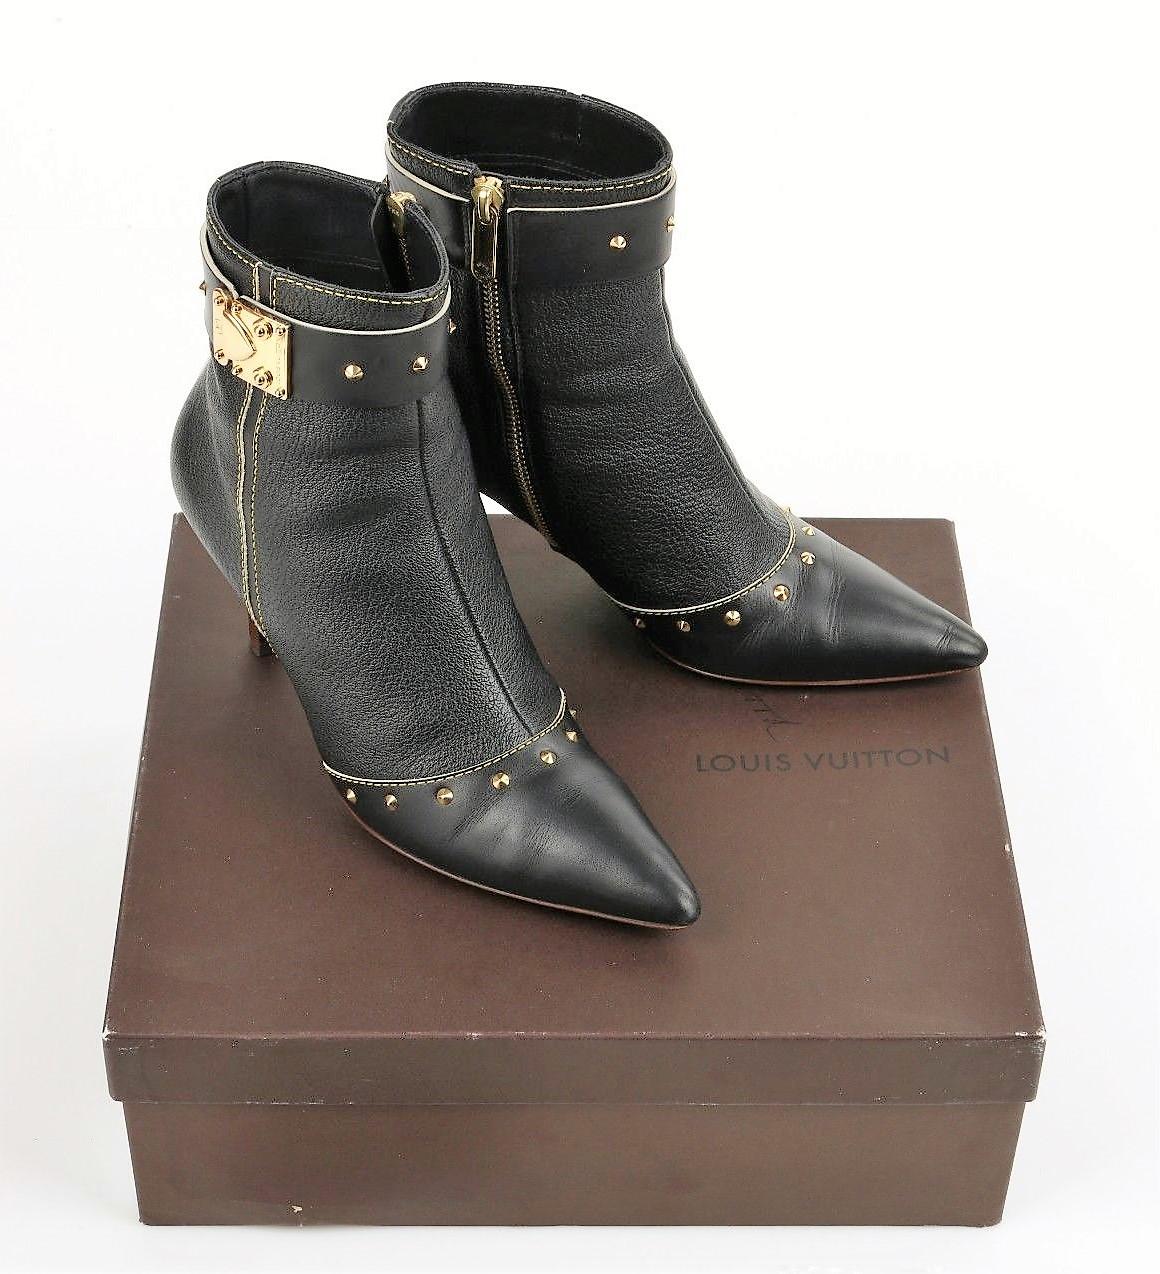 Louis Vuitton Women S Boots Size 9 Property Room